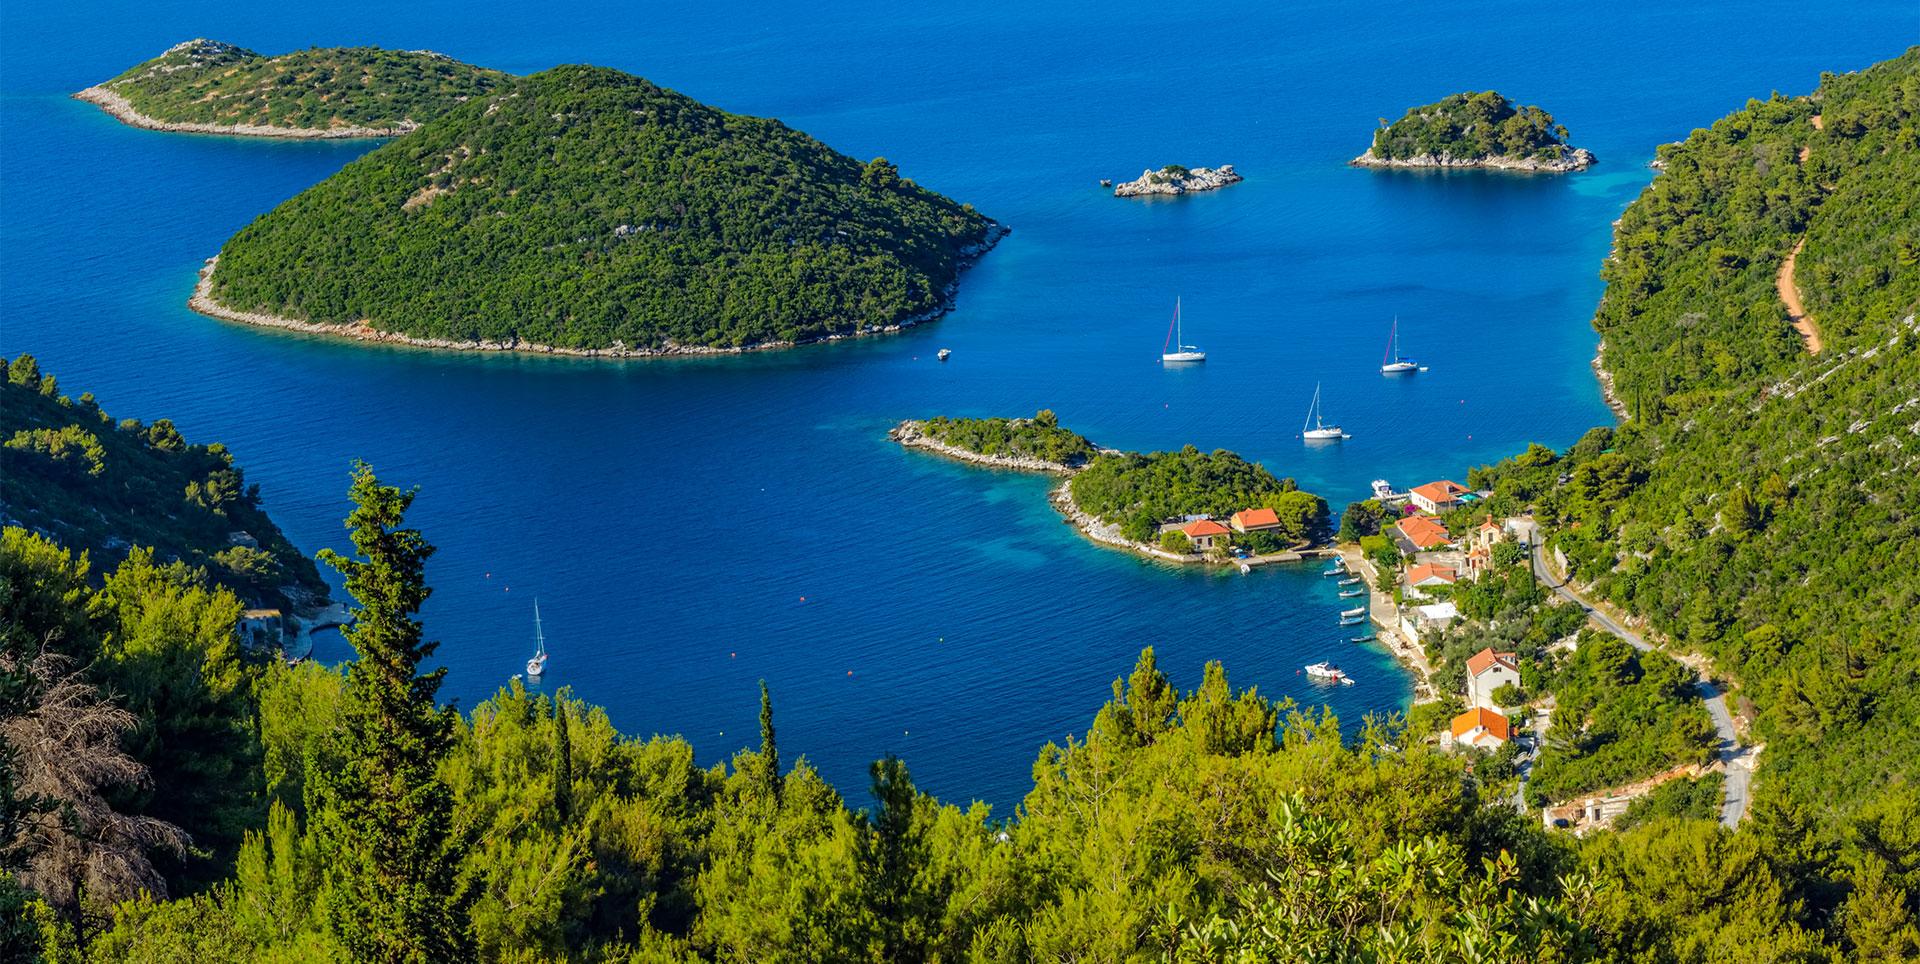 monasteryof-st-mary-at-island-mljet-secret-world